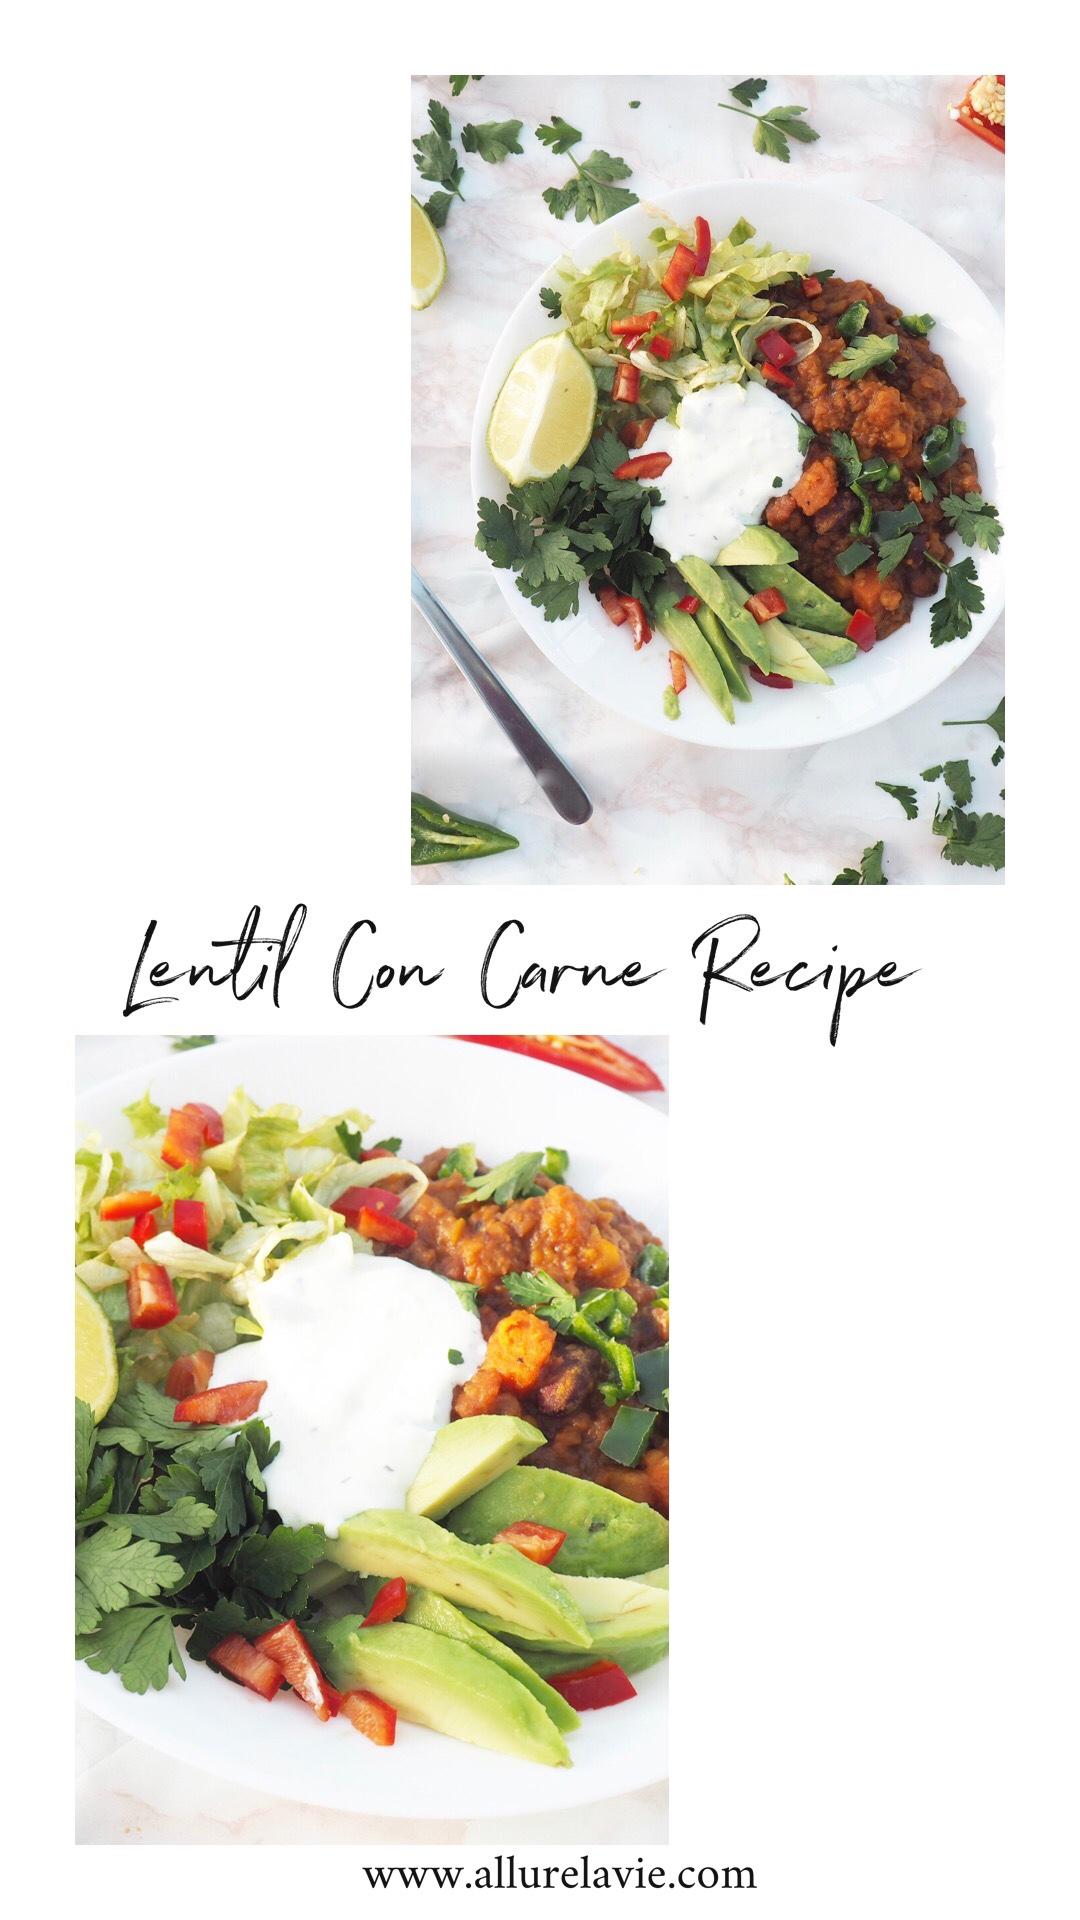 Lentil Con Carne Recipe